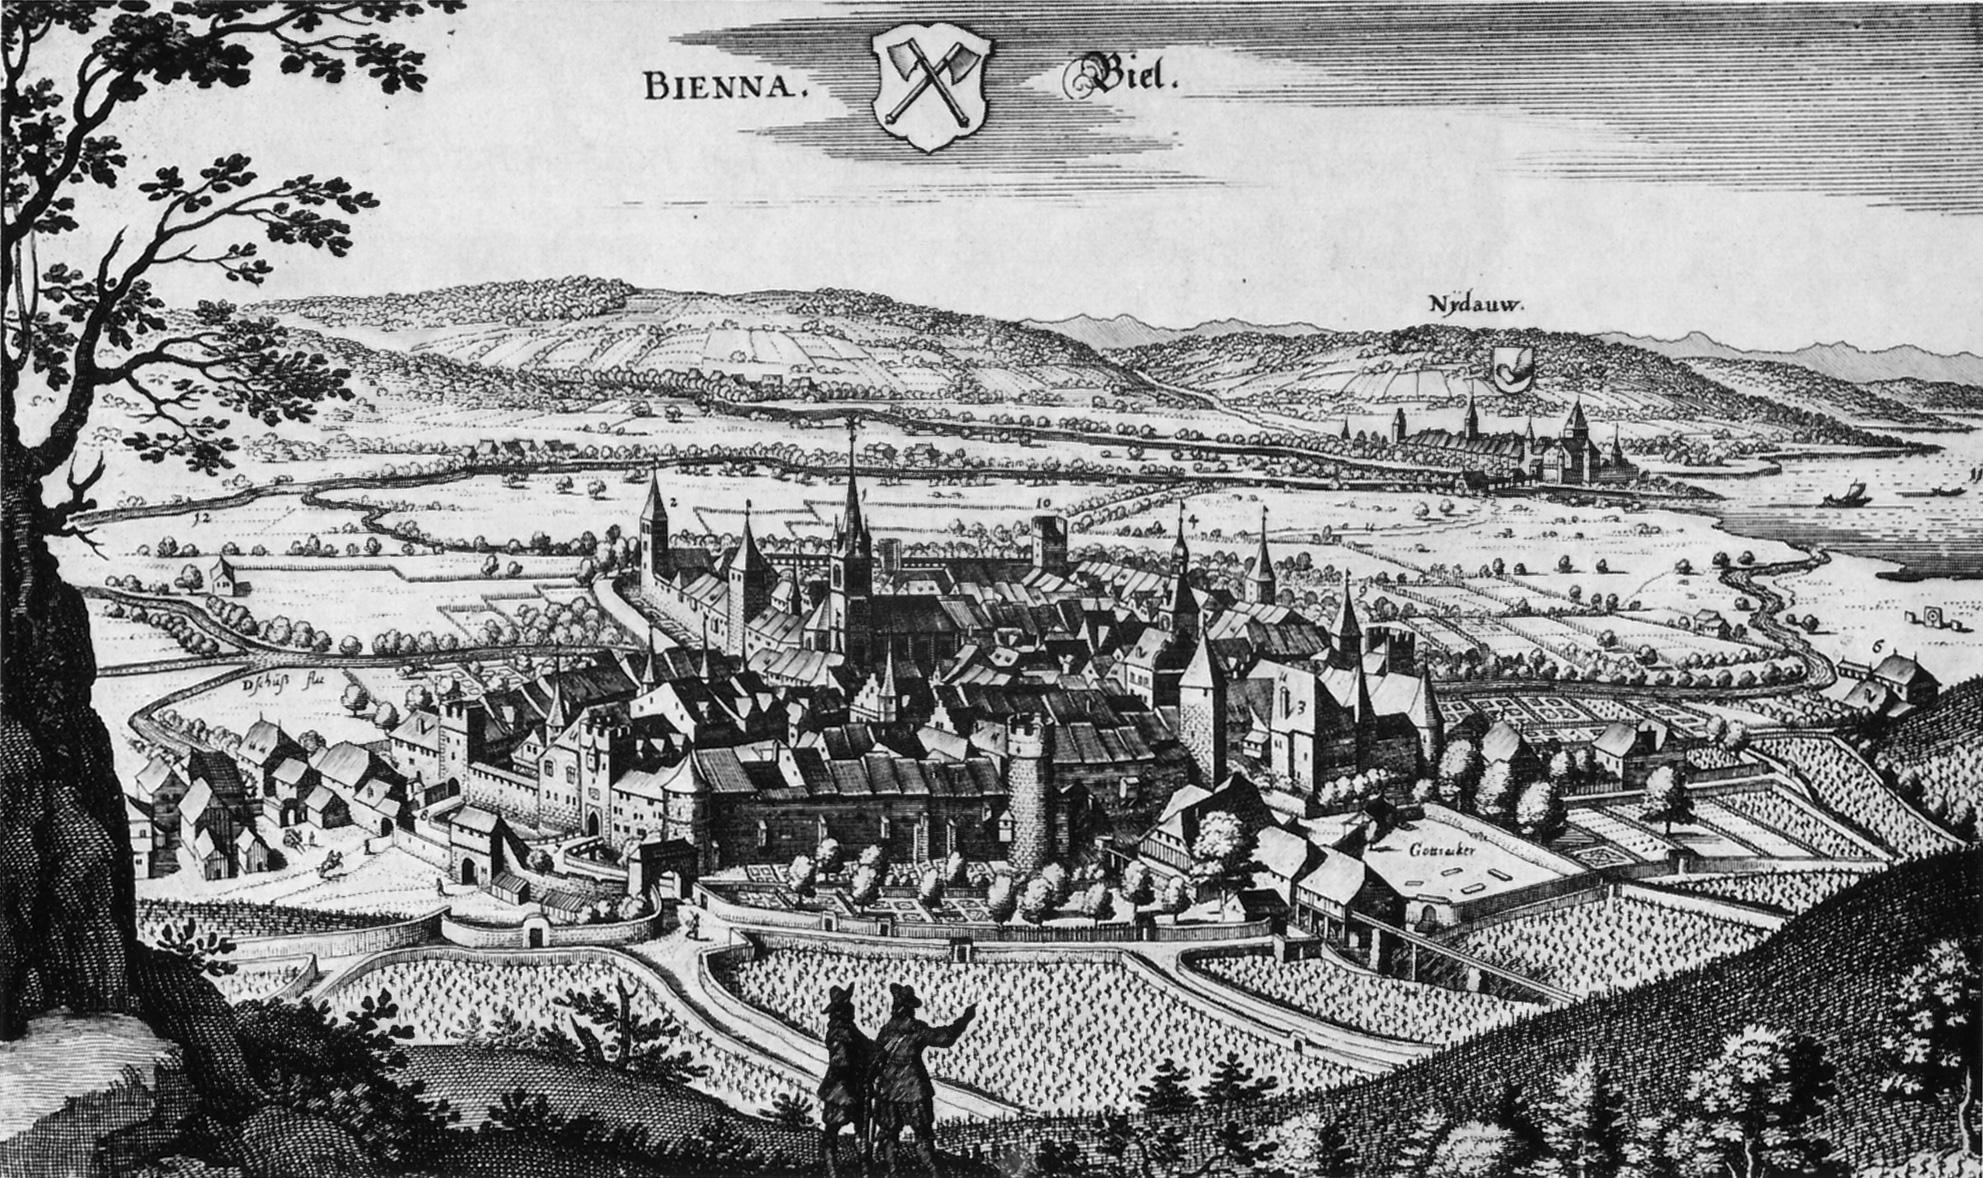 File:Merian Biel 1642.jpg - Wikipedia